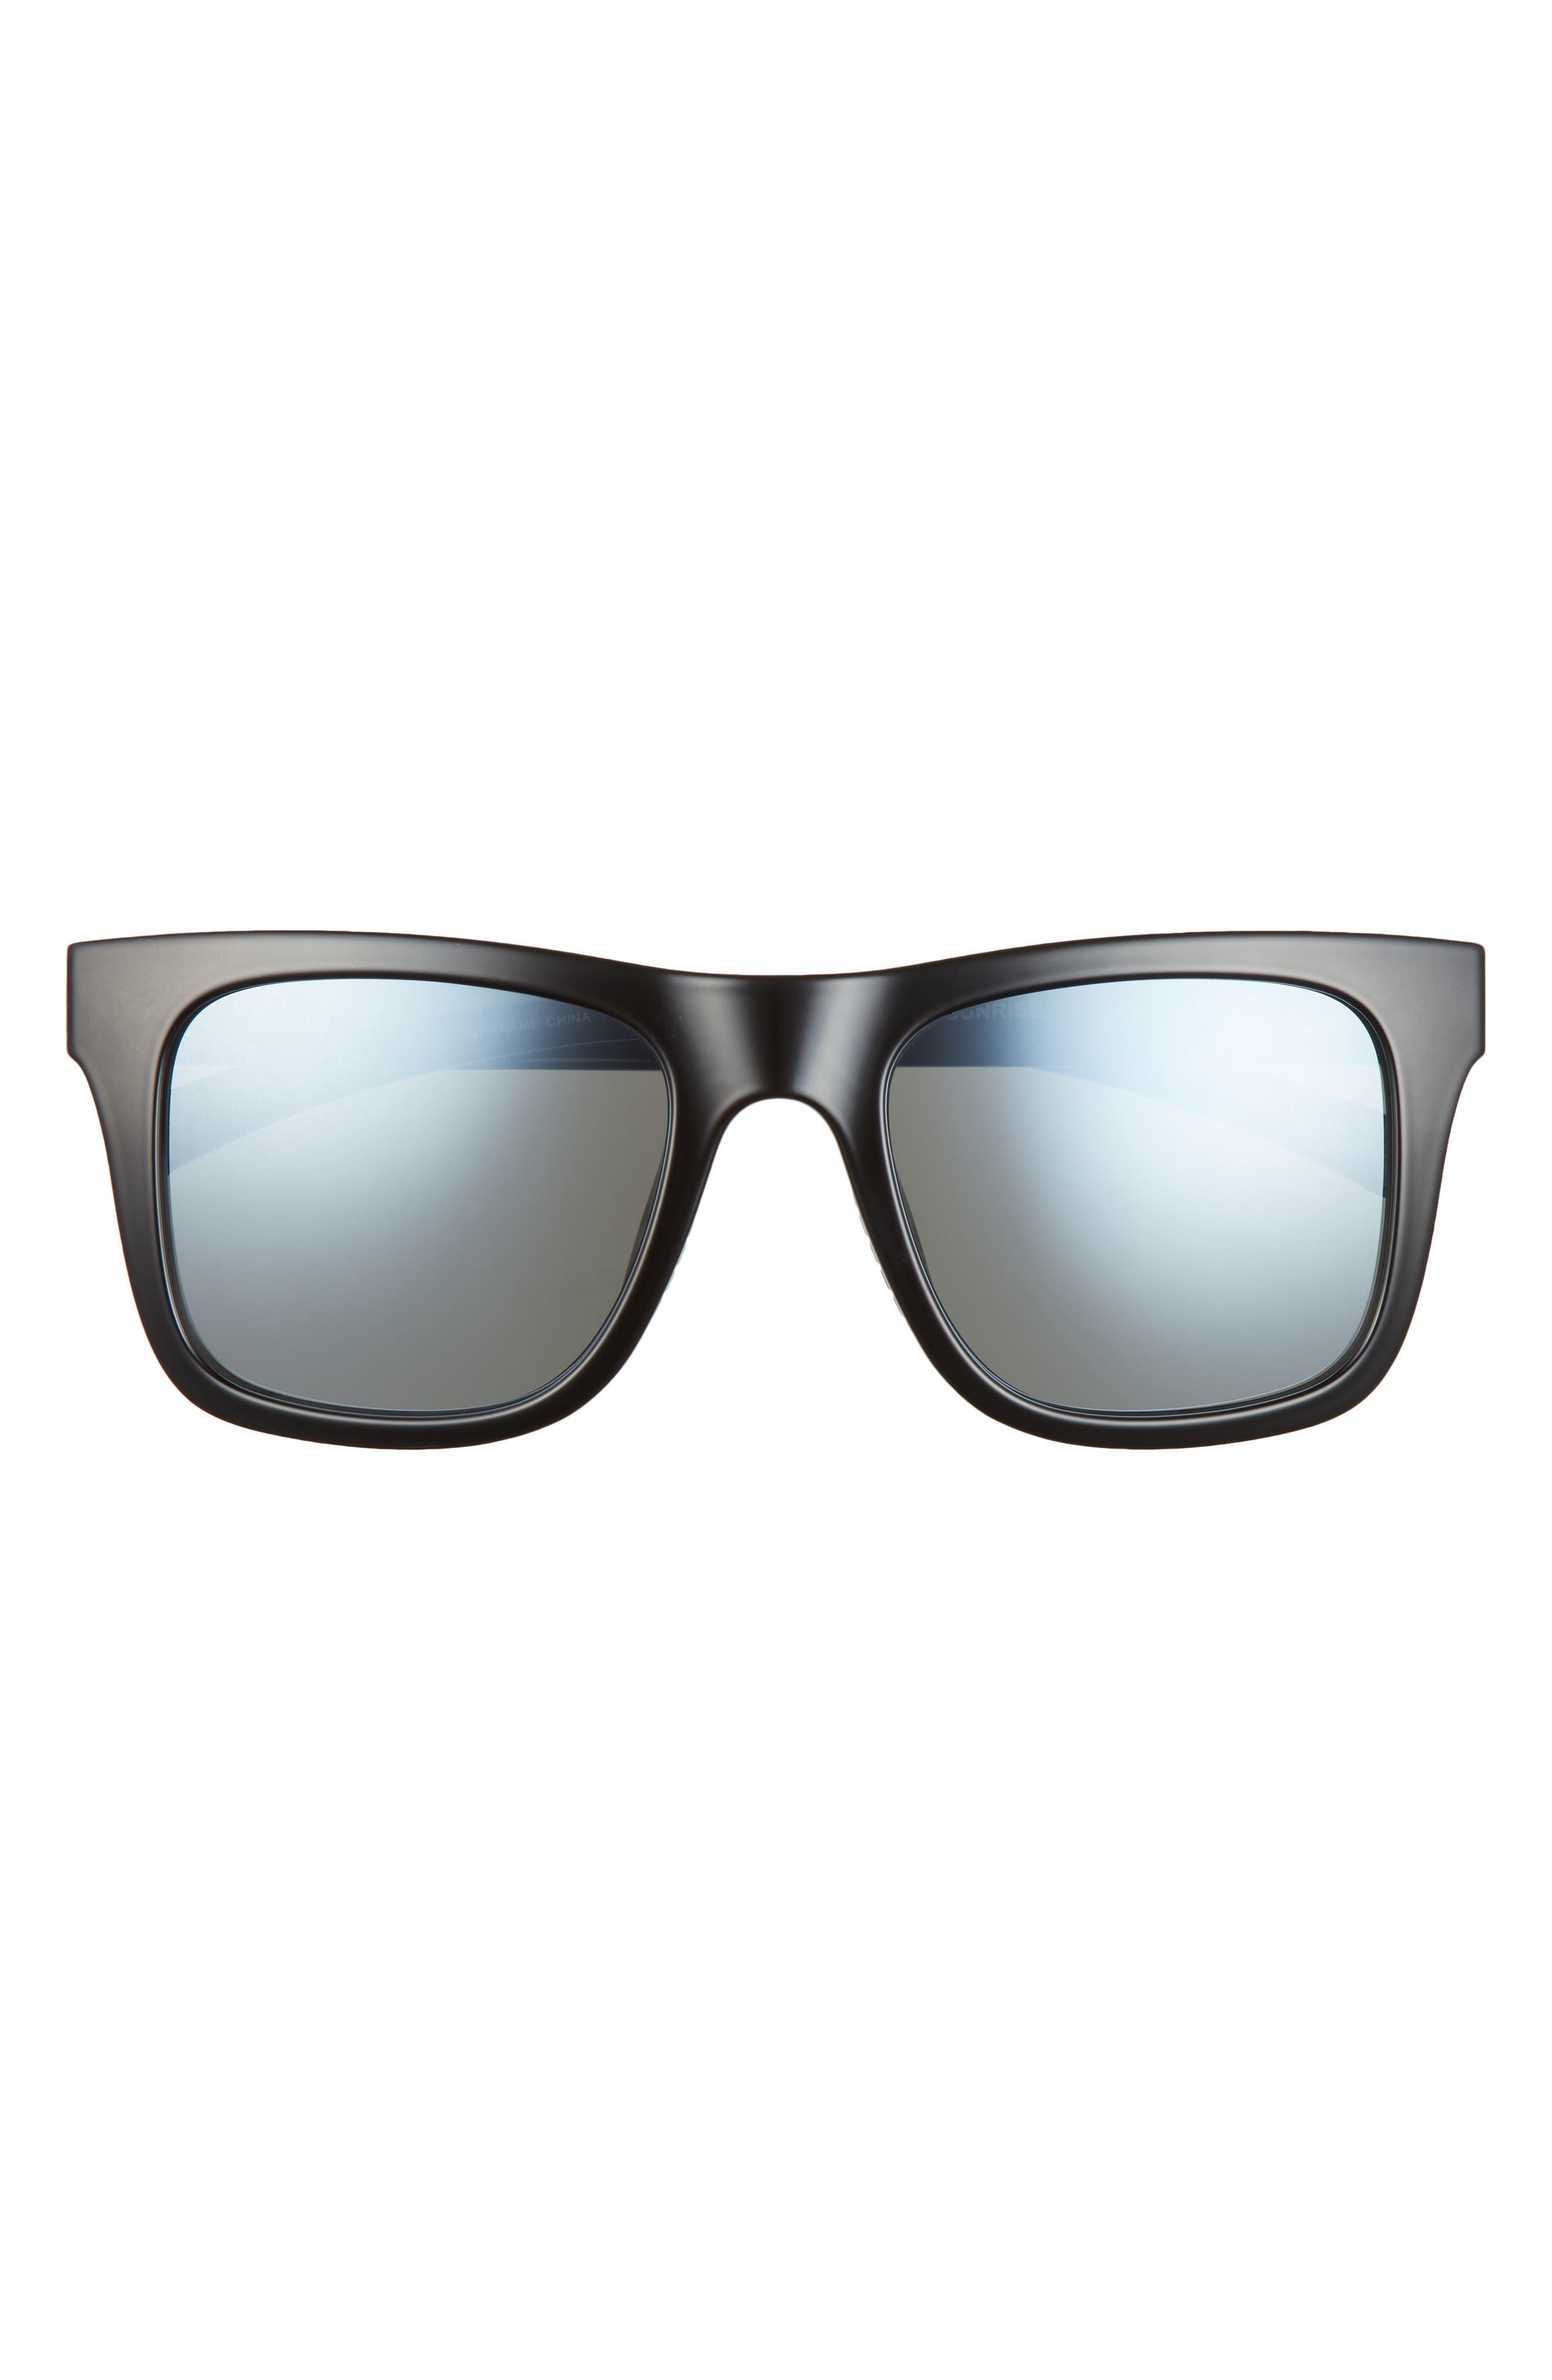 Sunrise 53mm Polarized Square Sunglasses